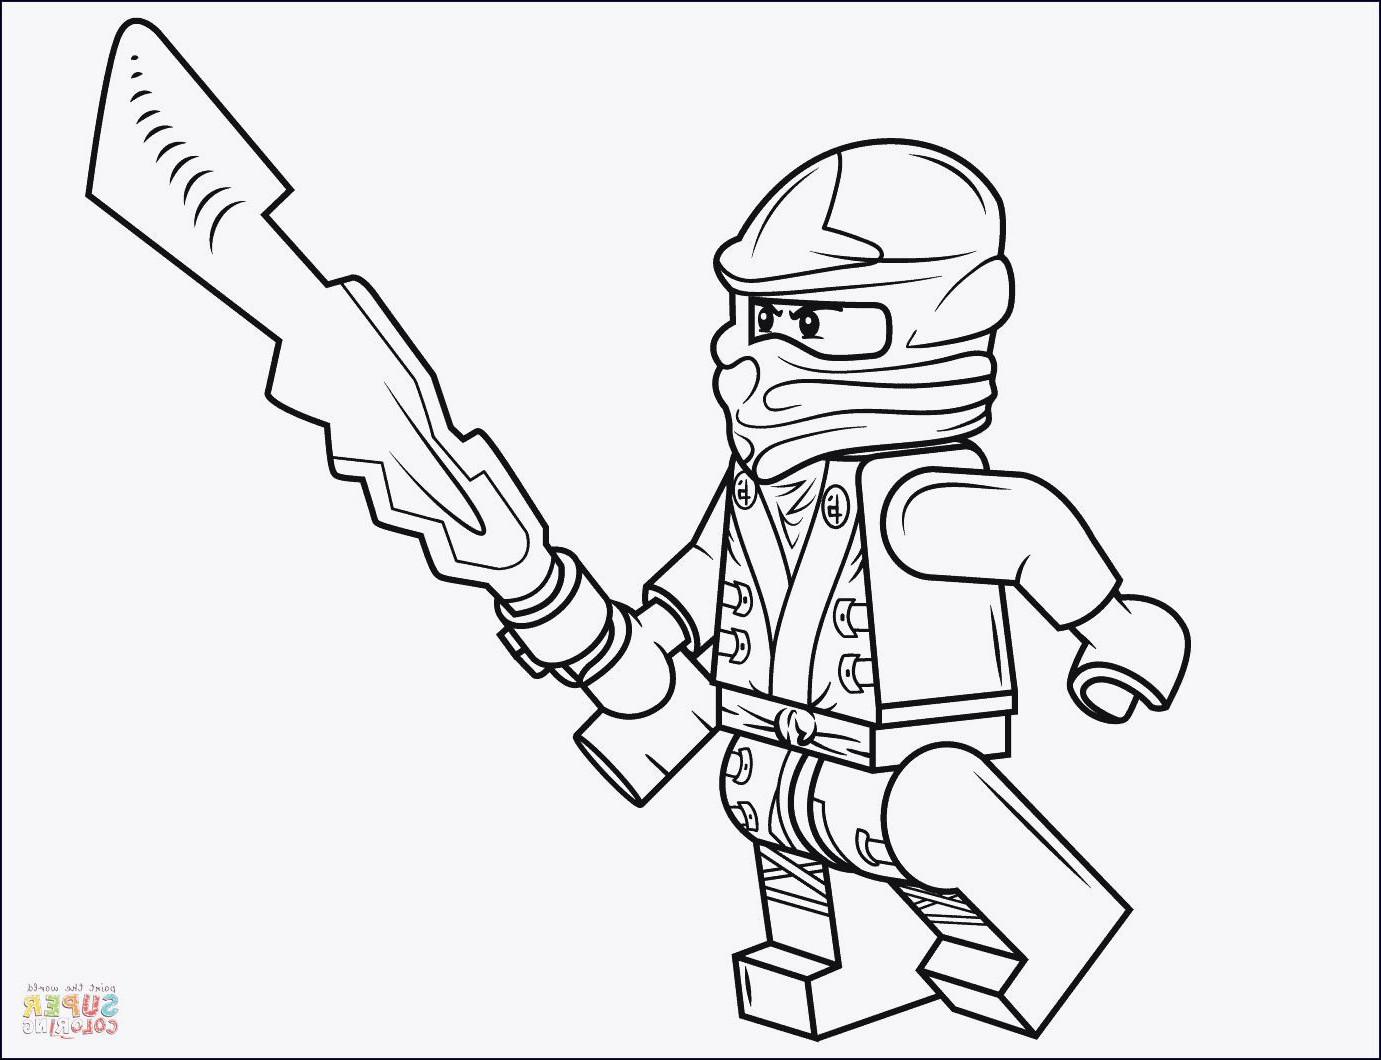 Ausmalbilder Zum Ausdrucken Ninjago Genial 29 Fantastisch Ninjago Ausmalbilder – Malvorlagen Ideen Bild